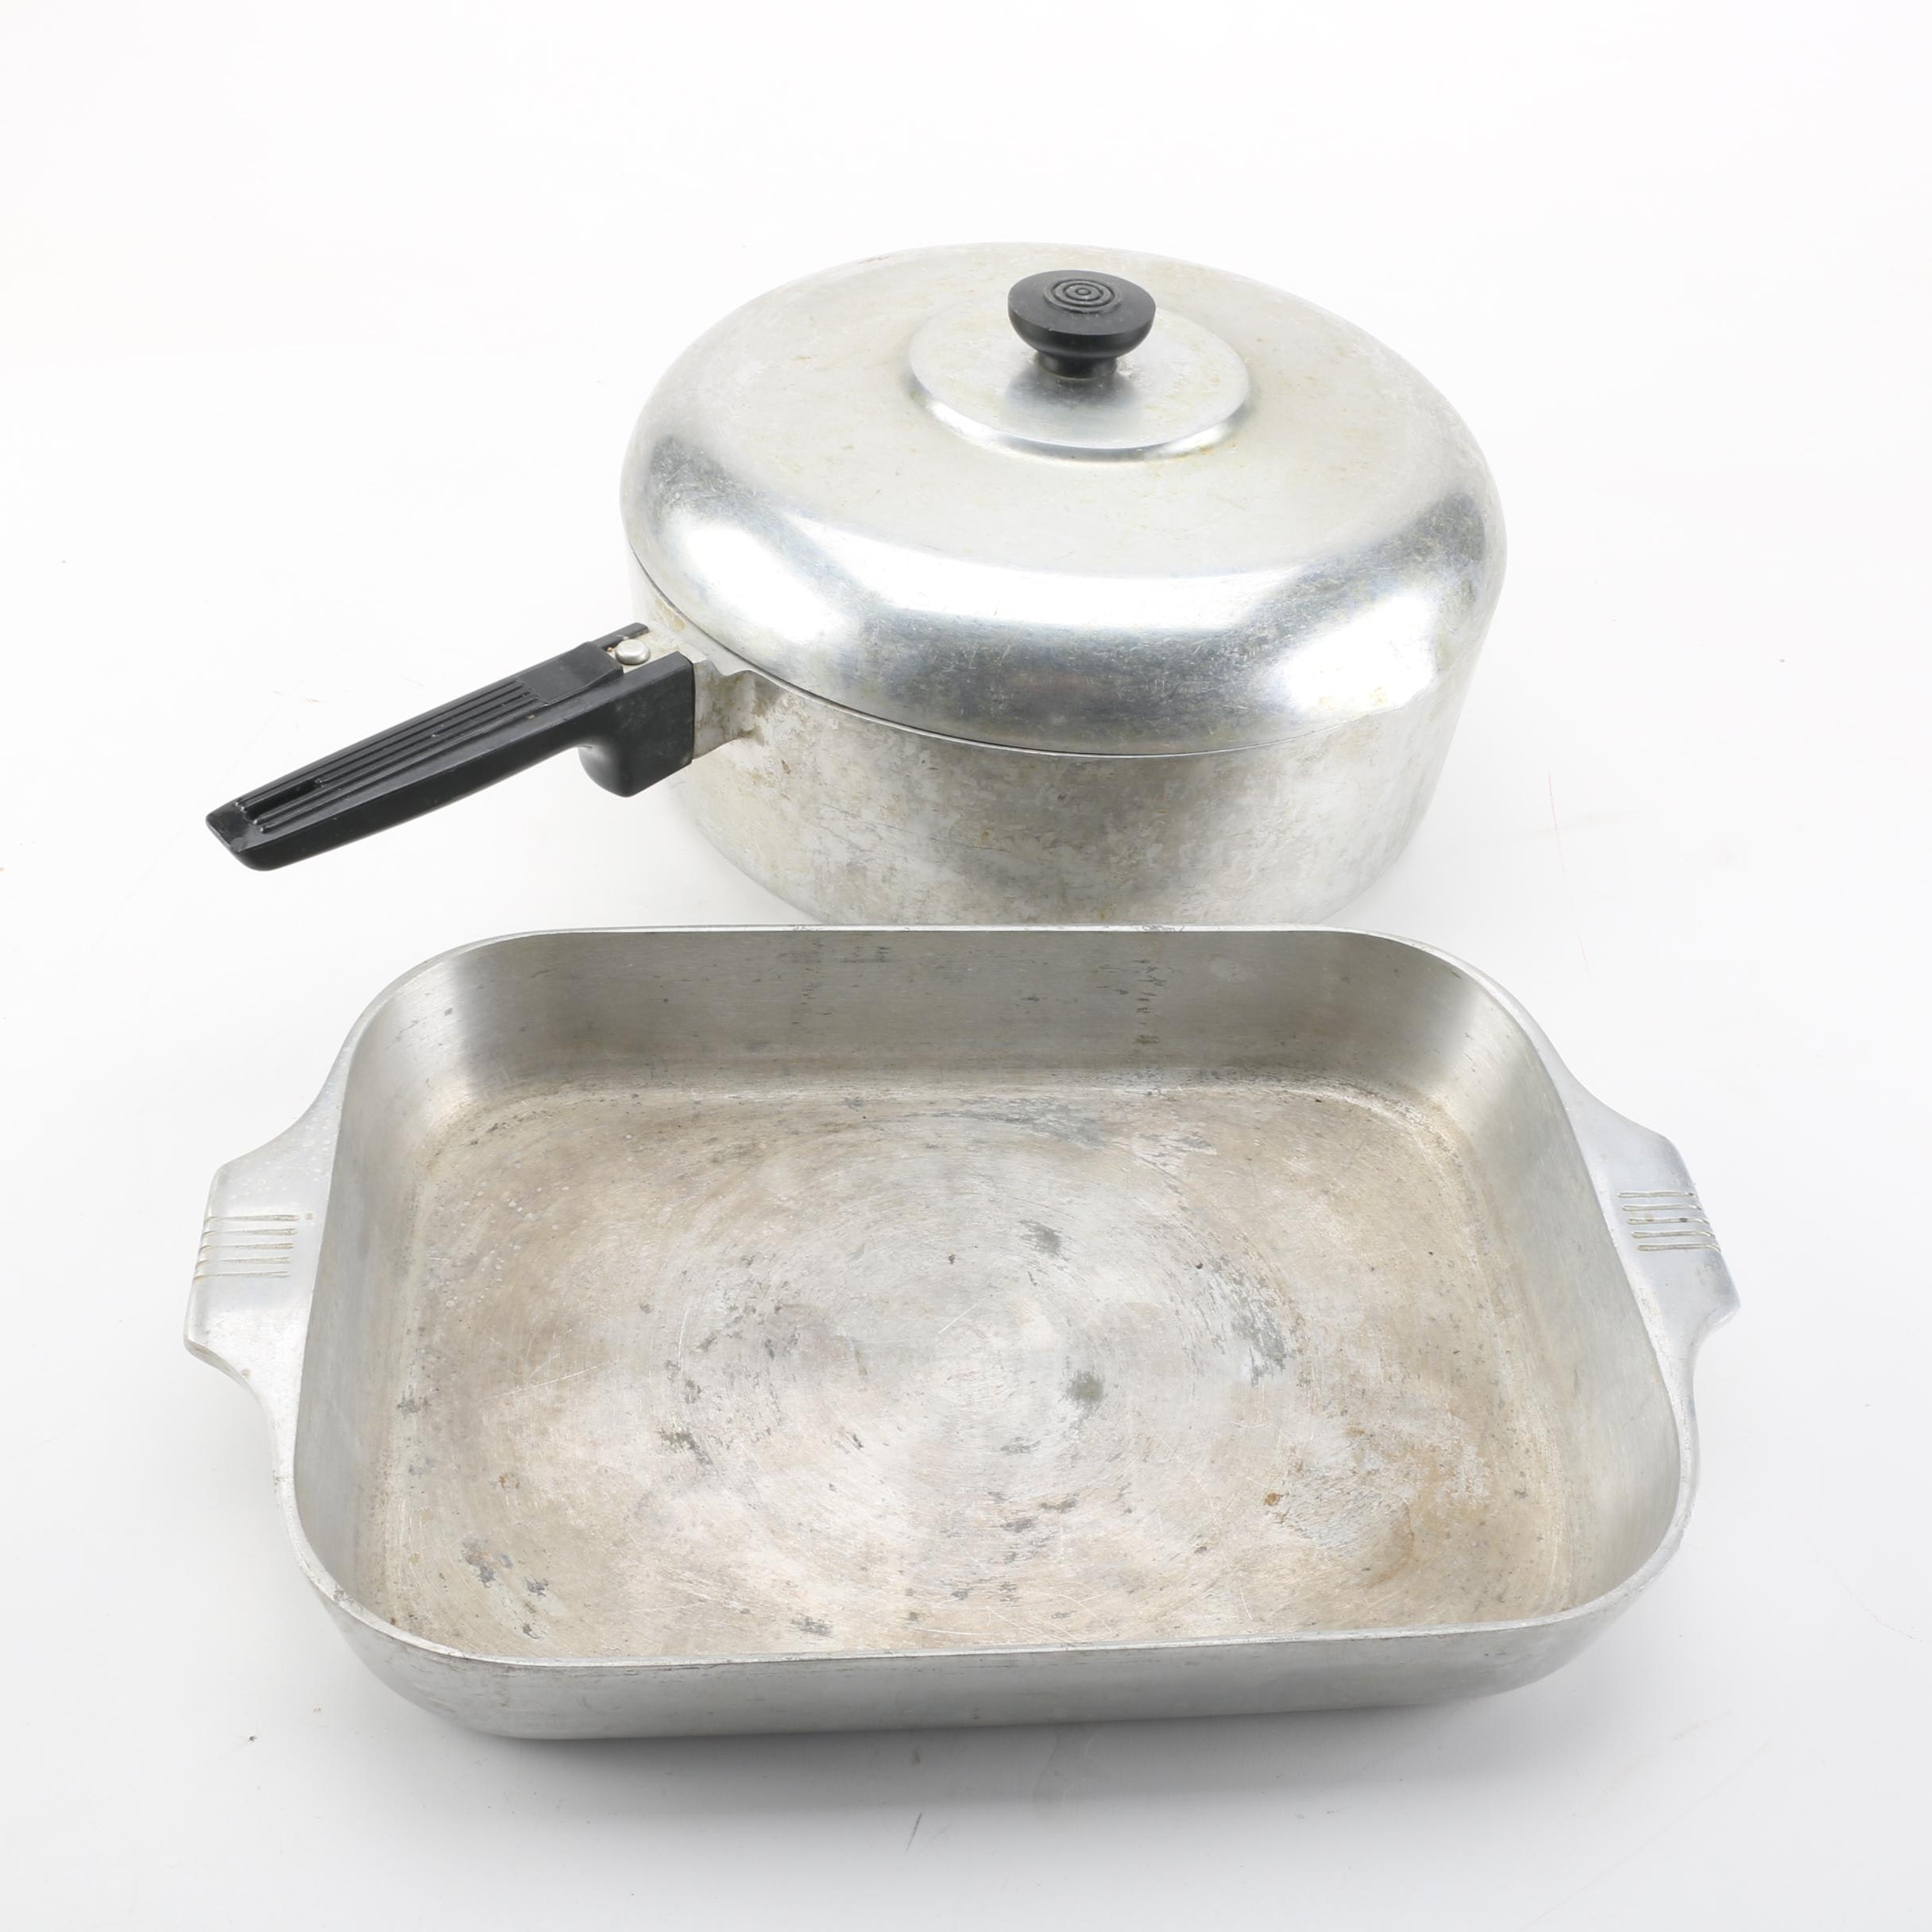 Vintage Magnalite Cookware